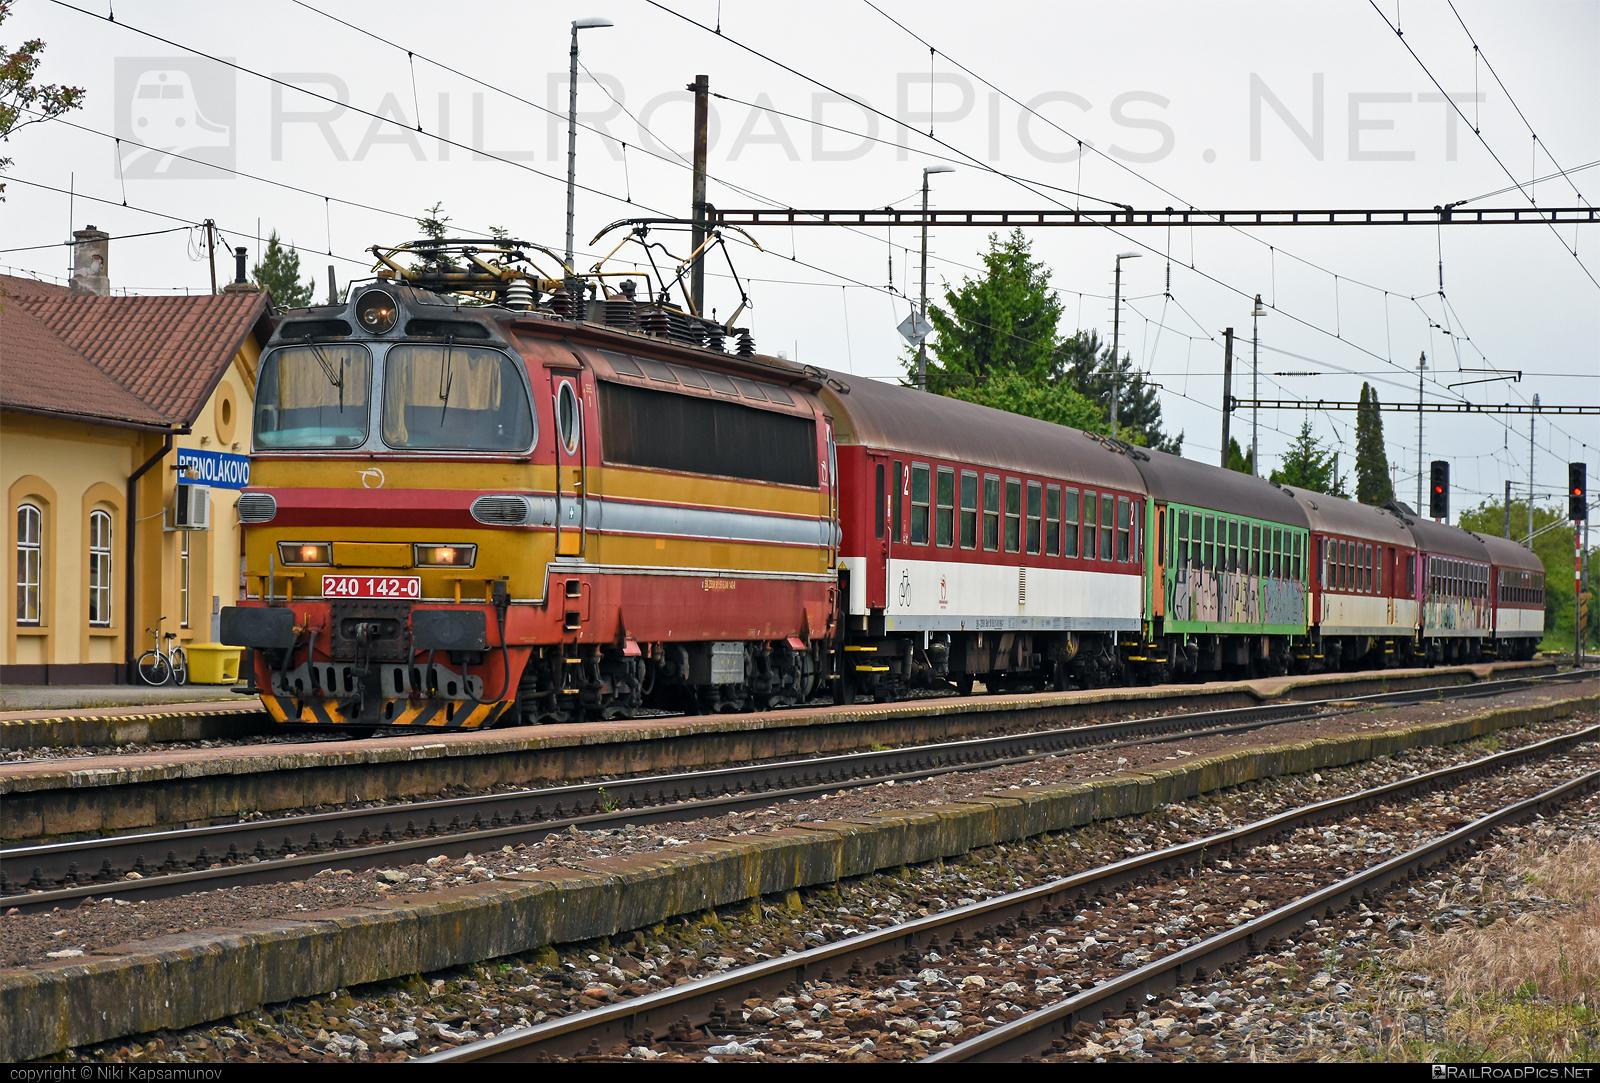 Škoda 47E - 240 142-0 operated by Železničná Spoločnost' Slovensko, a.s. #ZeleznicnaSpolocnostSlovensko #laminatka #locomotive240 #skoda #skoda47e #zssk